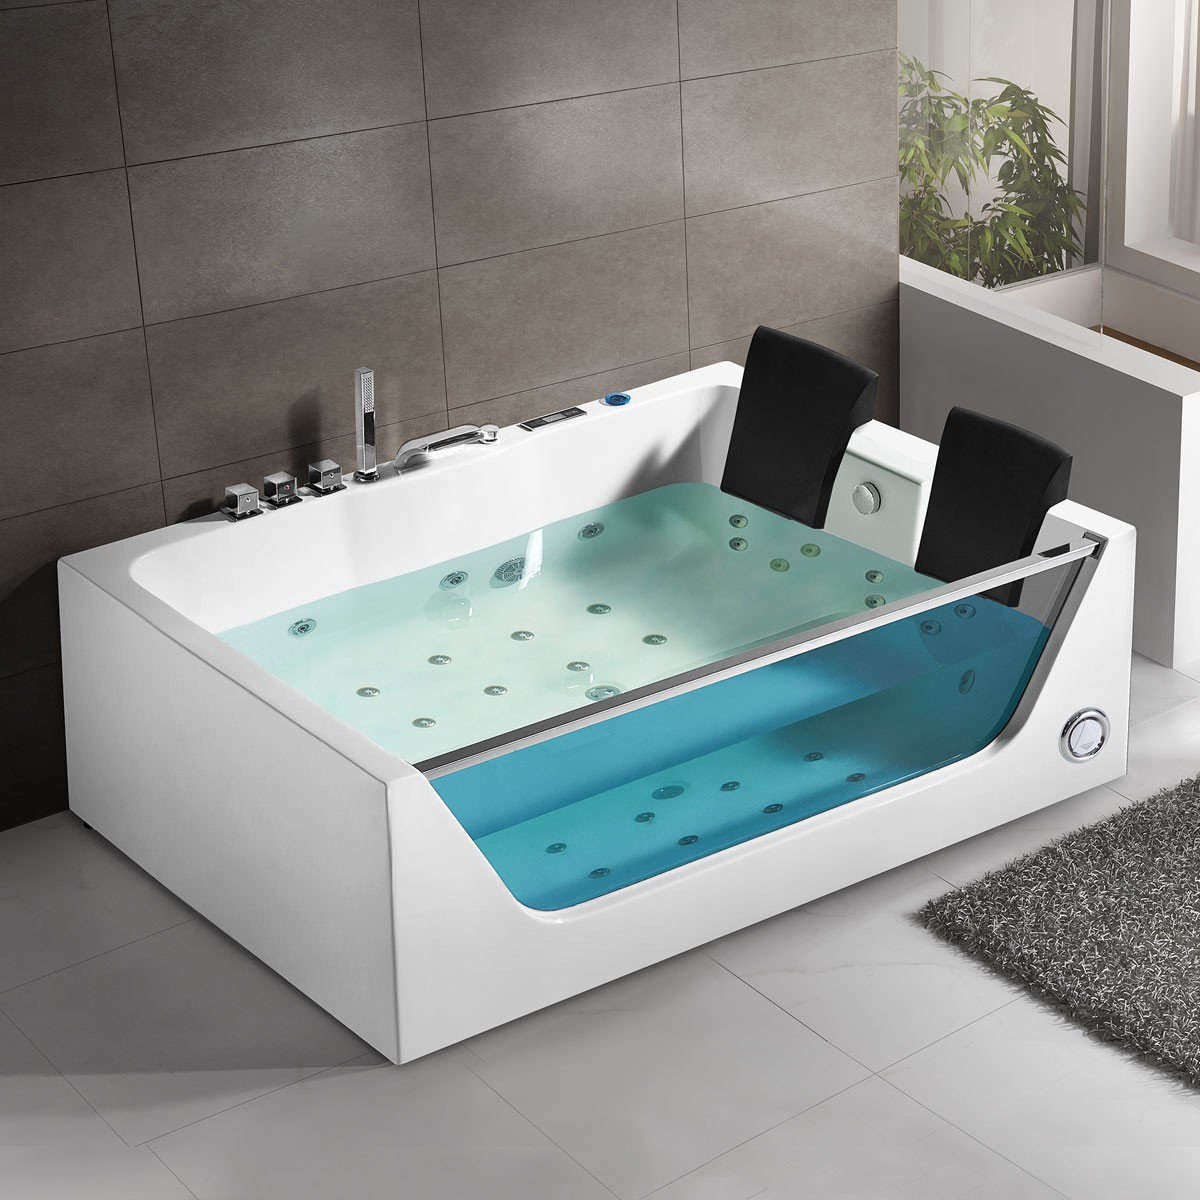 71 In Whirlpool Tub - Acrylic White (DK-Q411) | Decoraport Canada